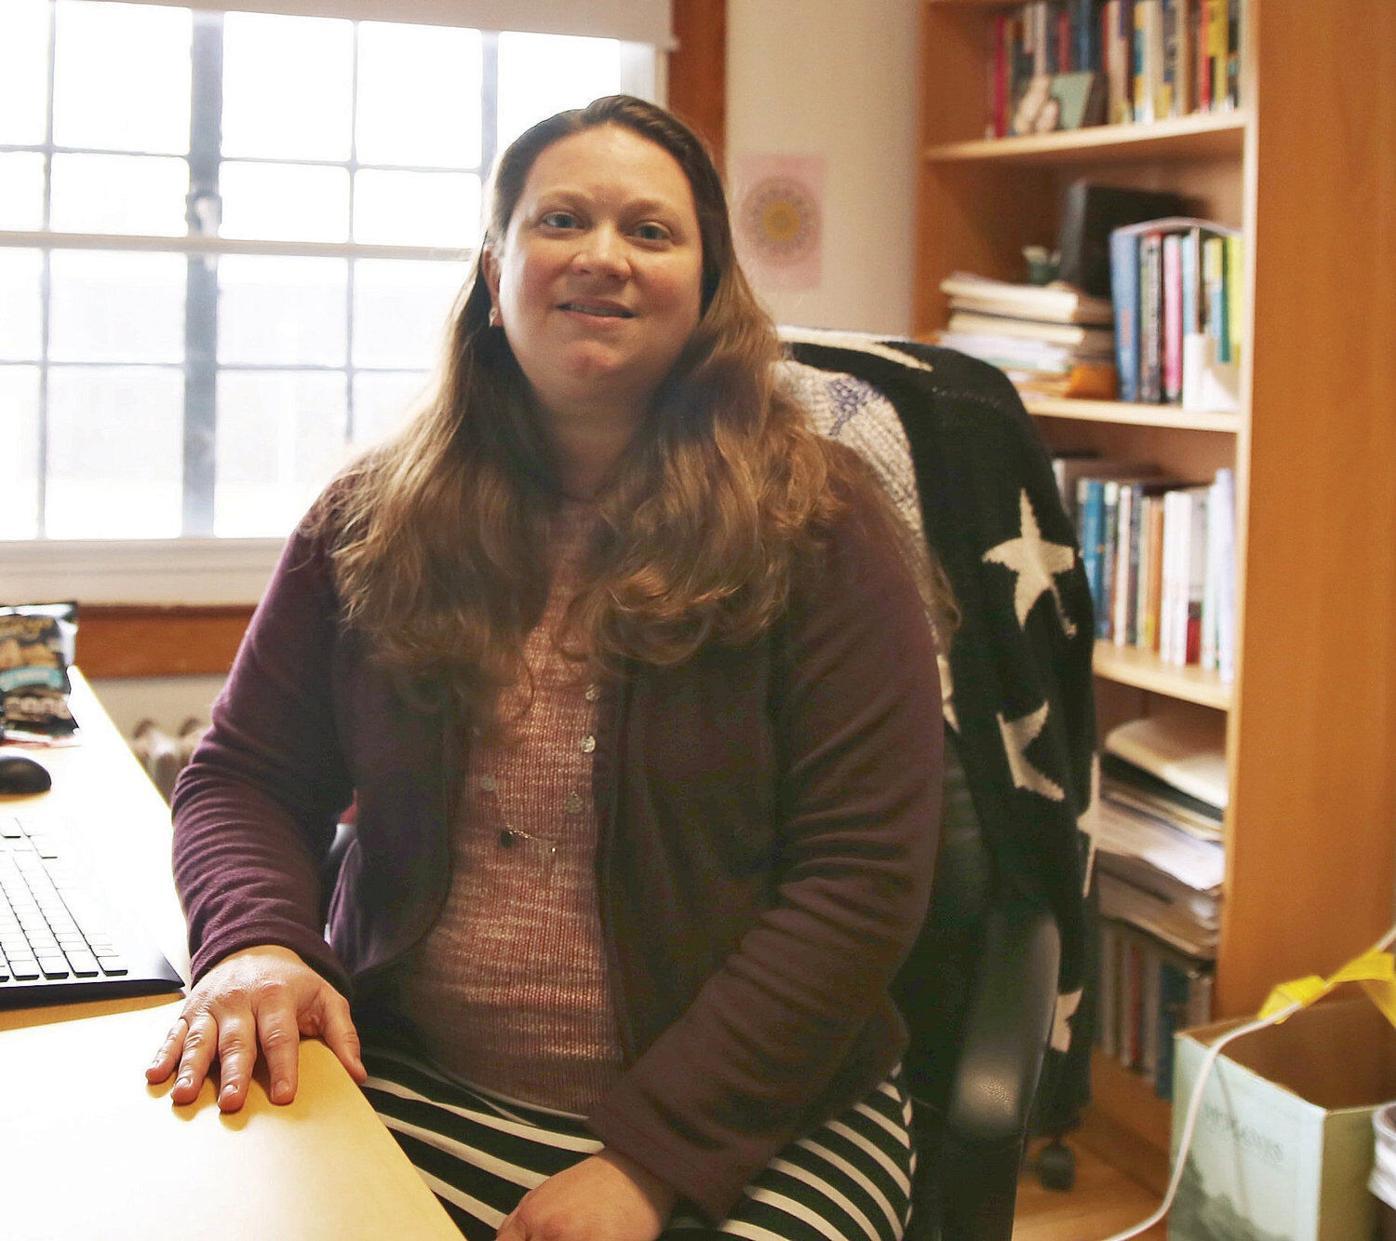 Bennington College adds mentoring program for first-generation students